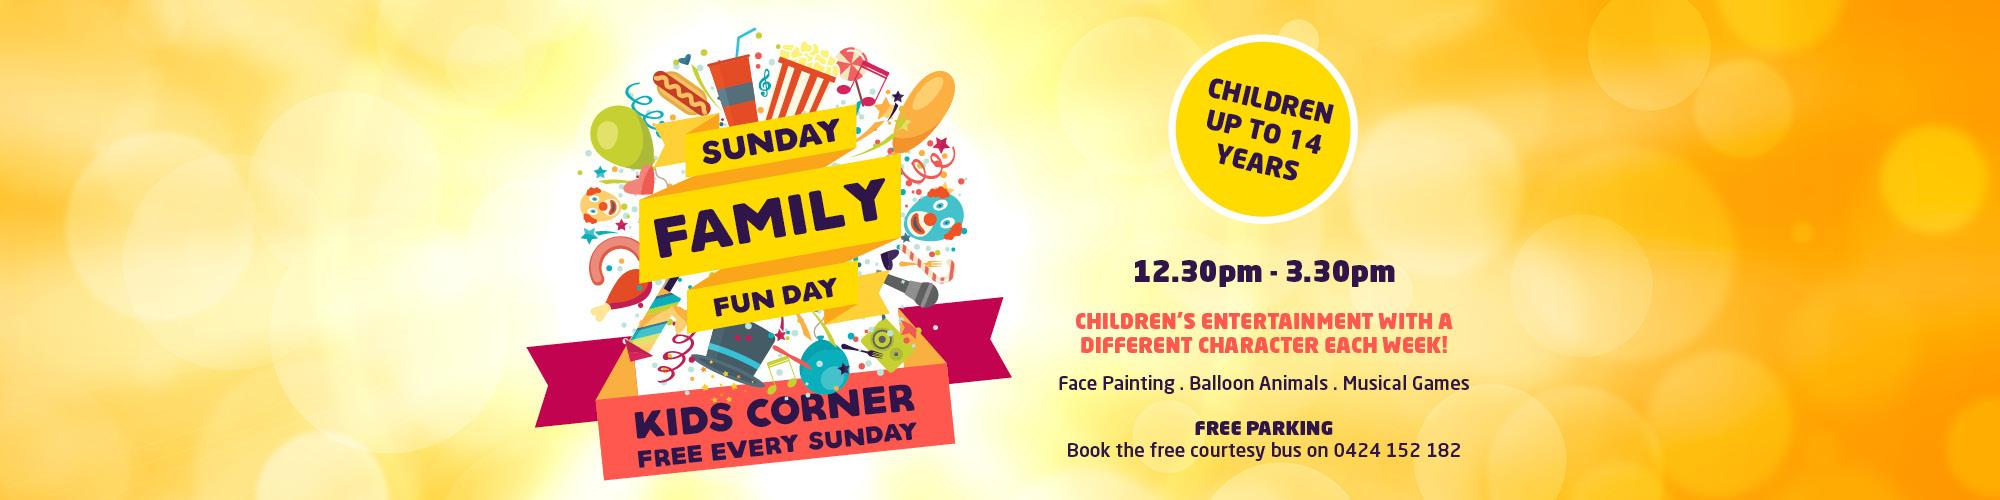 Family-Funday-kids-corner-website-slide-2000x500